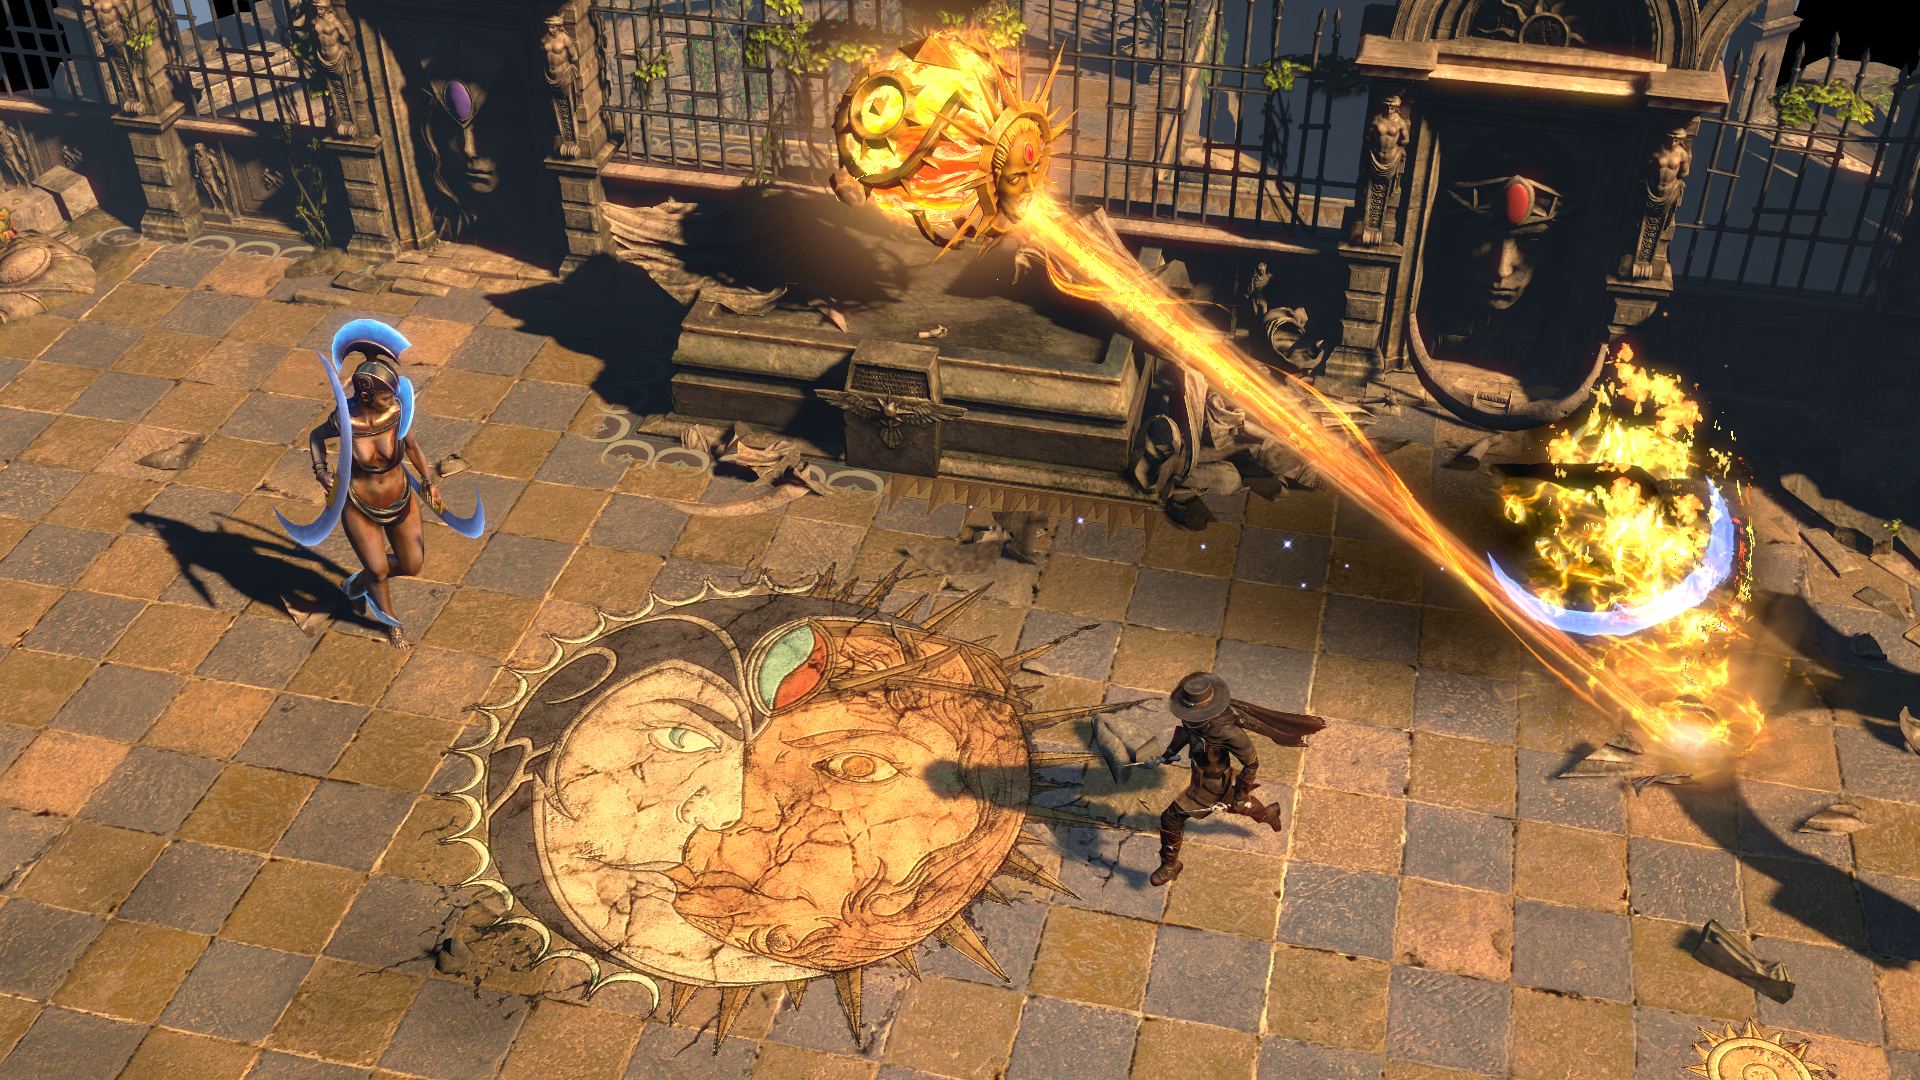 Path of Exile Solaris and Lunaris Battle Screenshot